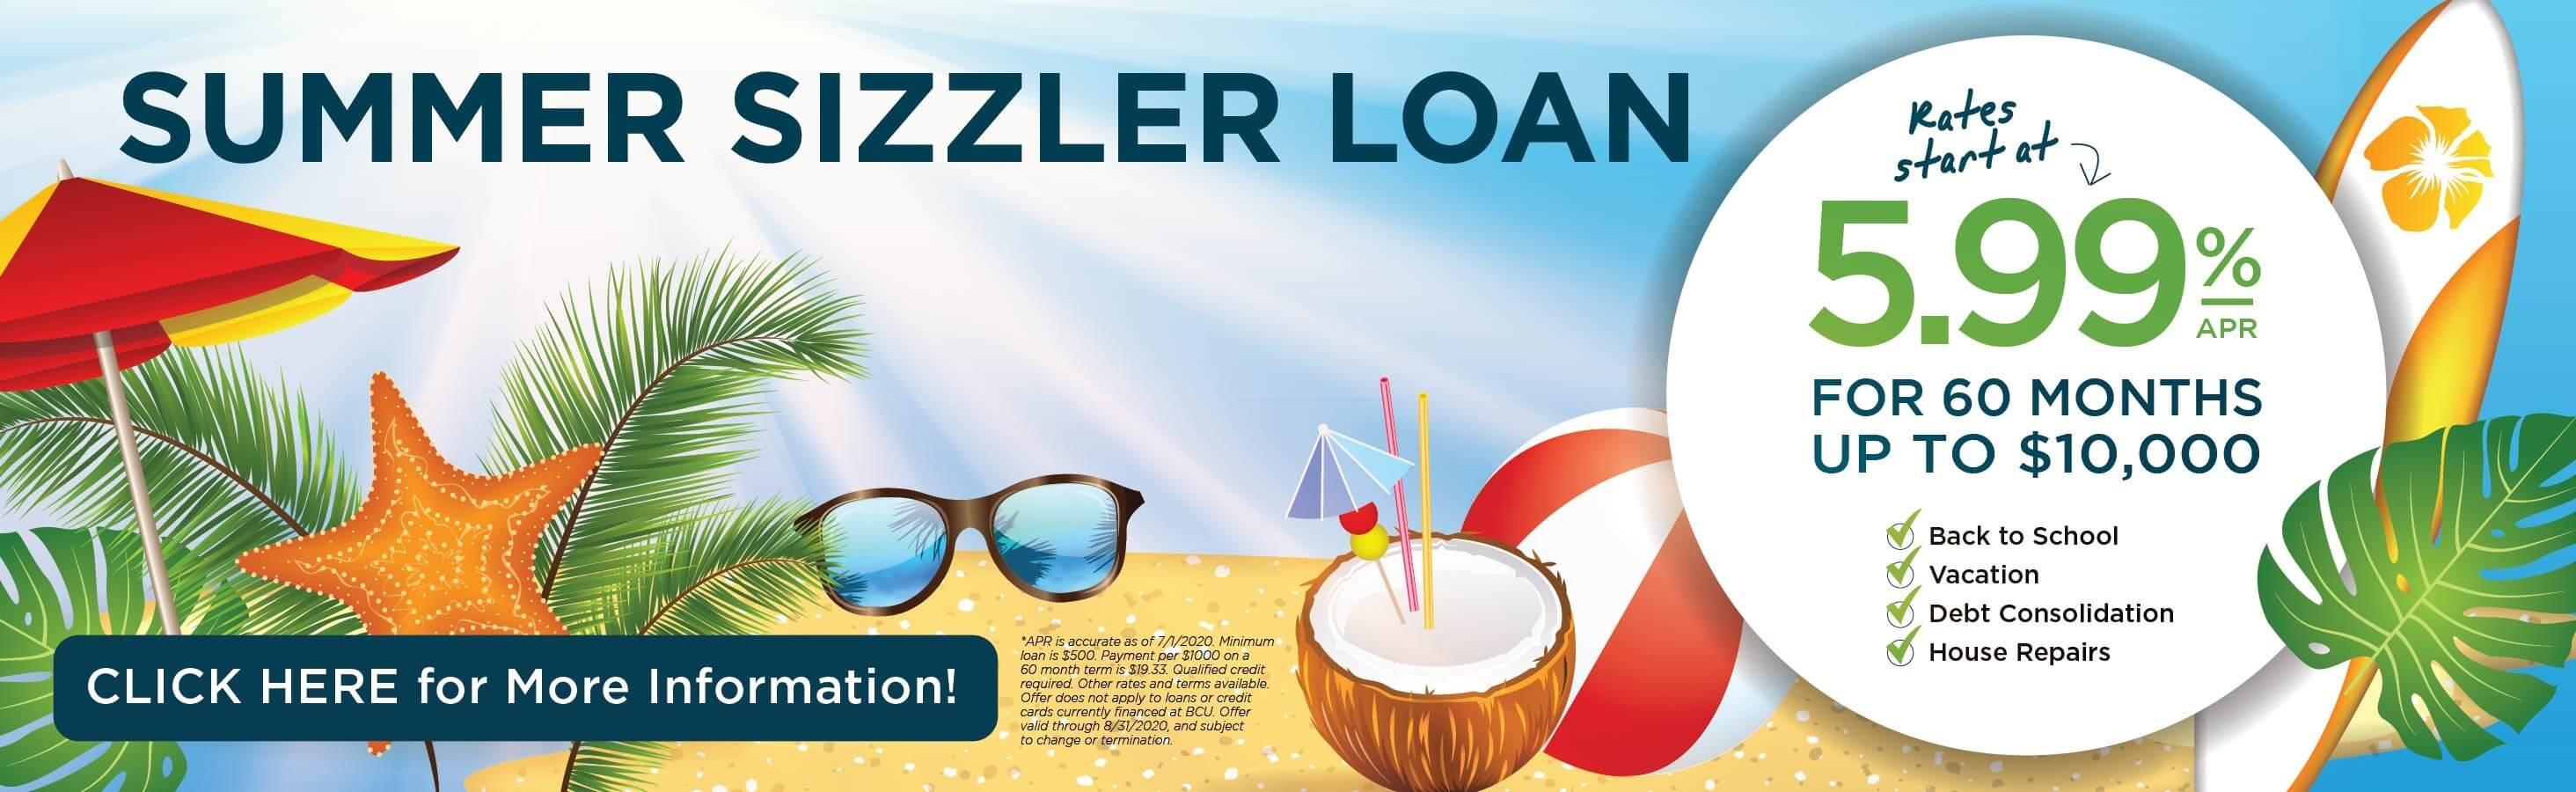 Summer Sizzler Loan